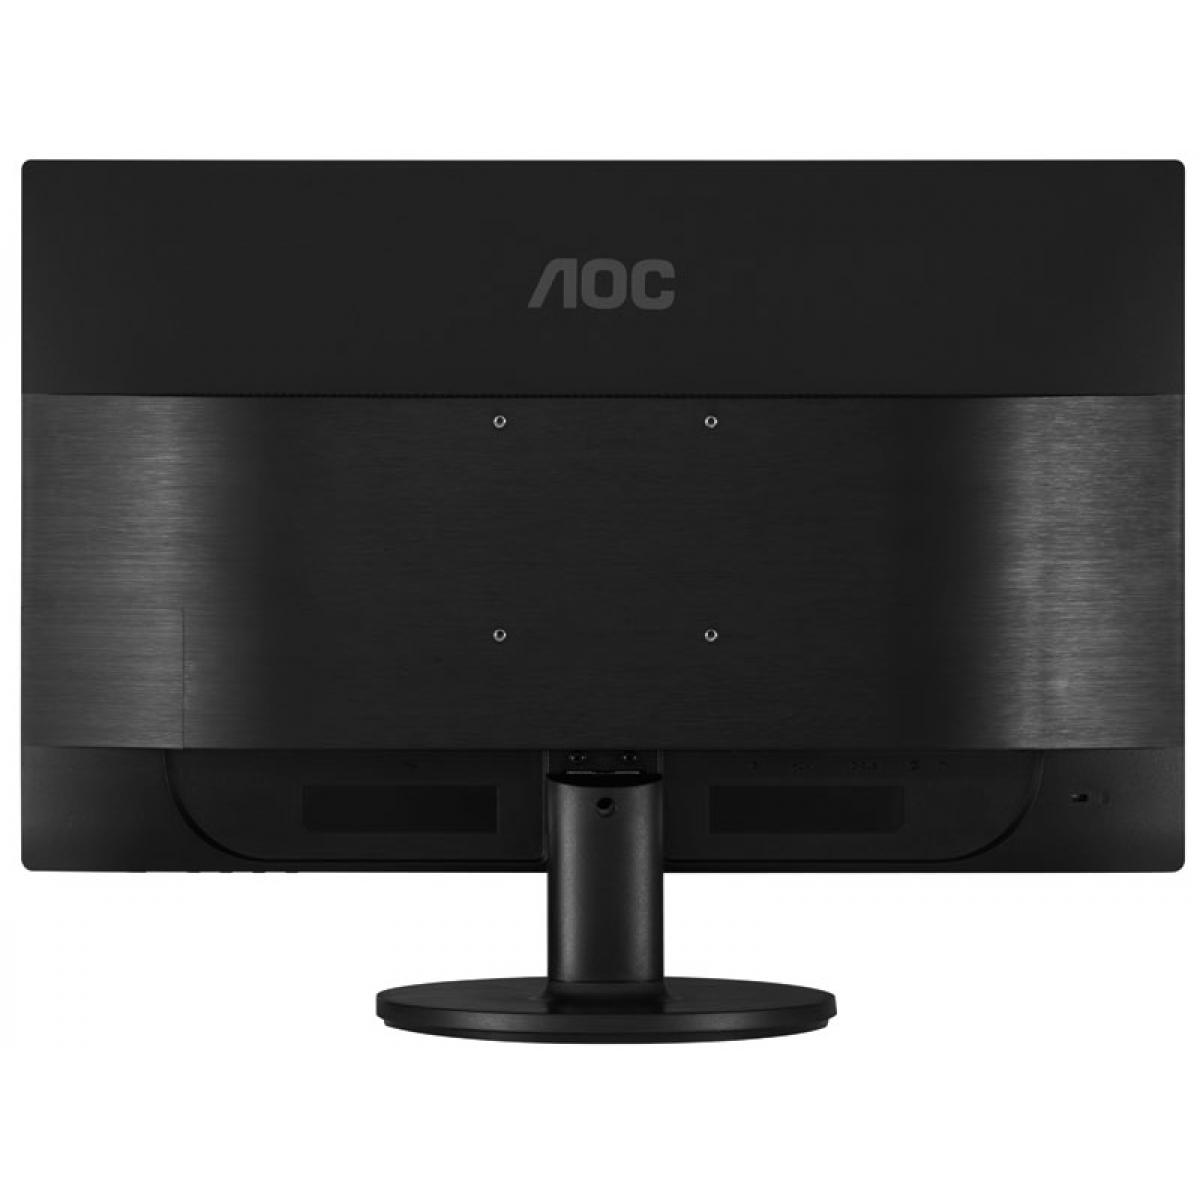 Monitor Gamer AOC 21.5 Pol, Full HD, 1ms, AMD Freesync, G2260VWQ6